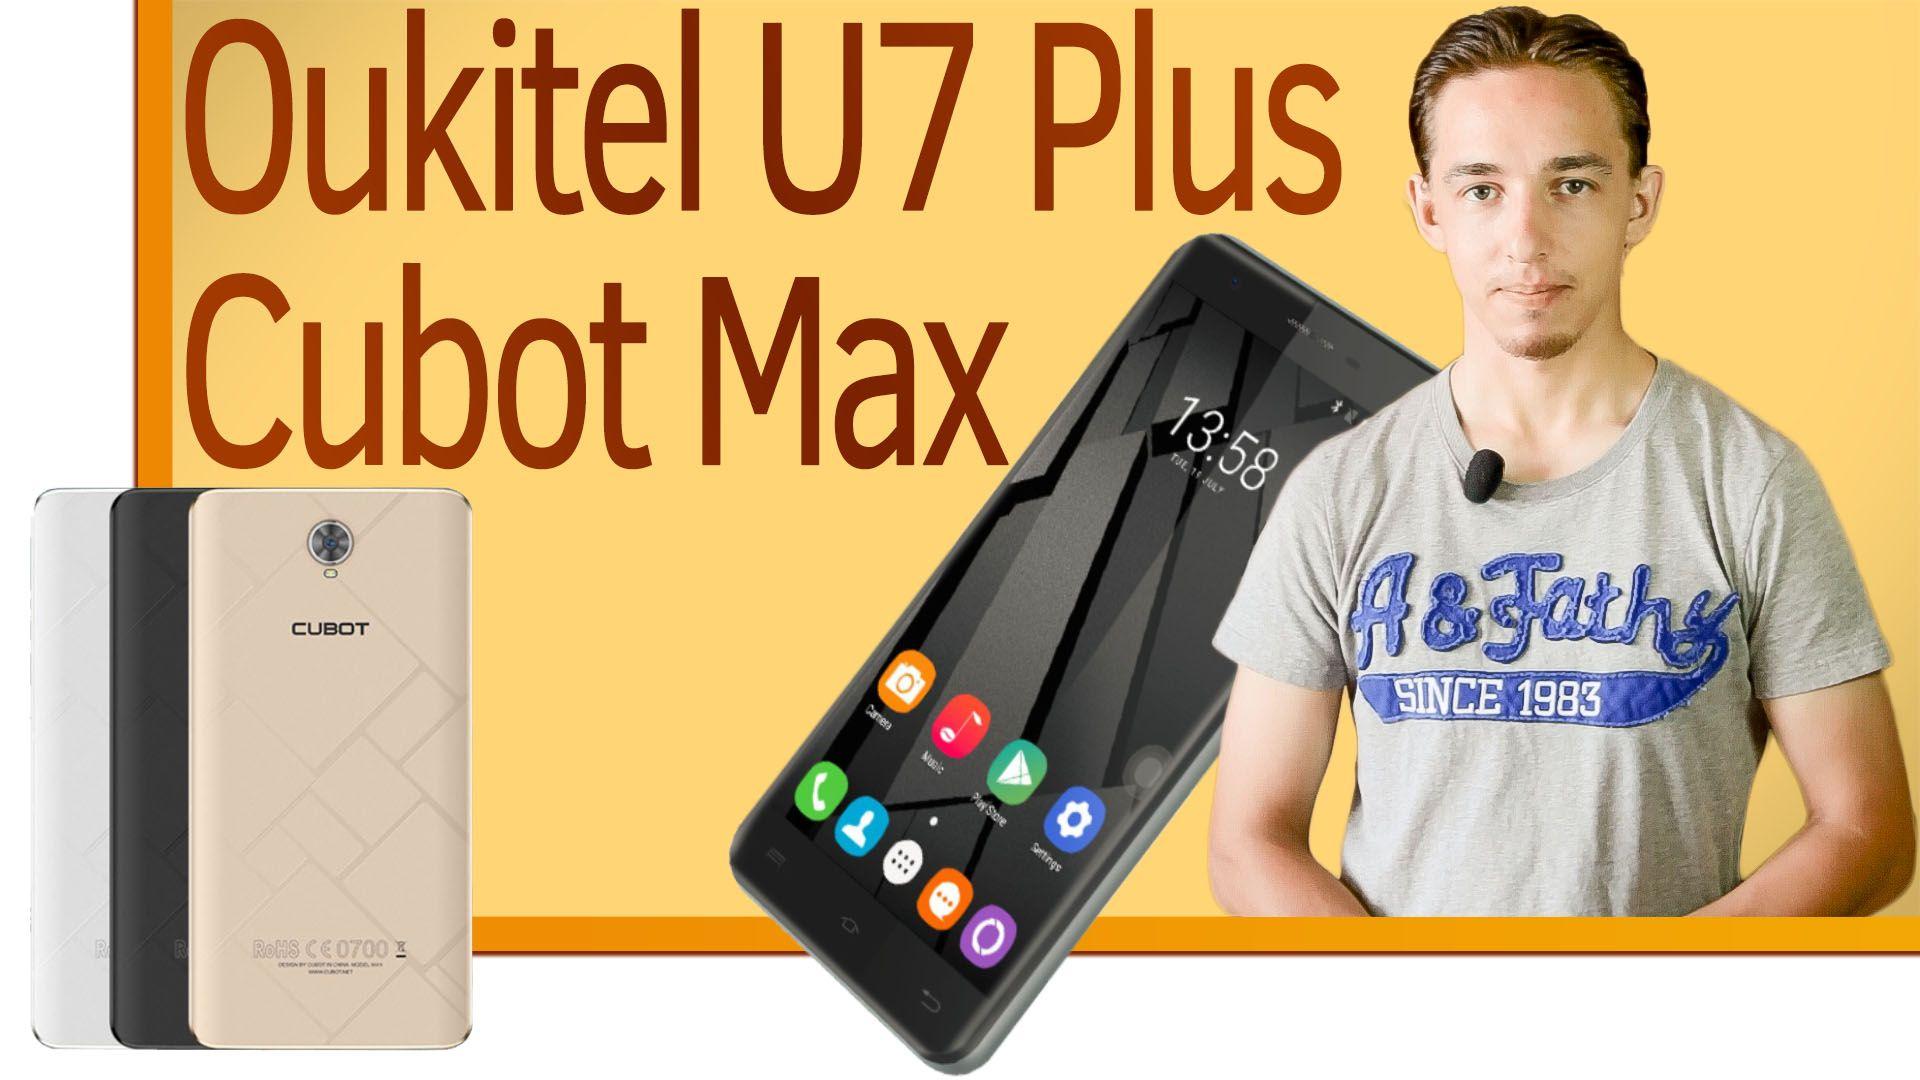 видео -https://www.youtube.com/watch?v=6ryrVEeGarY  обзор спецификаций новинок китая Oukitel U7 Plus  Cubot Max  19 августа 2016